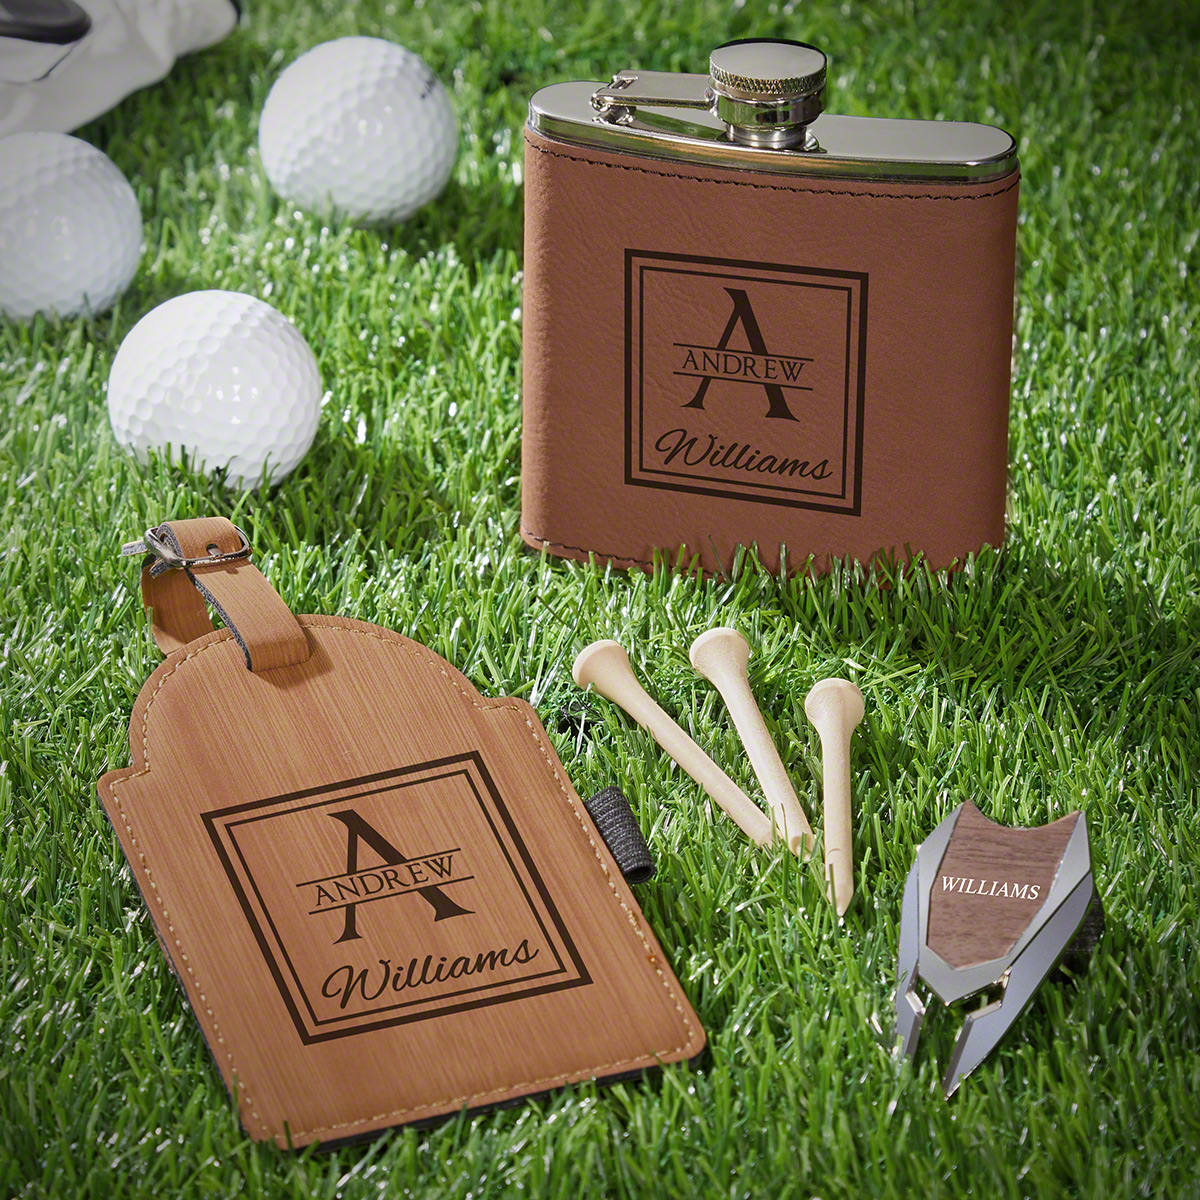 Oakhill Custom Flask Set of Gifts for Golfers